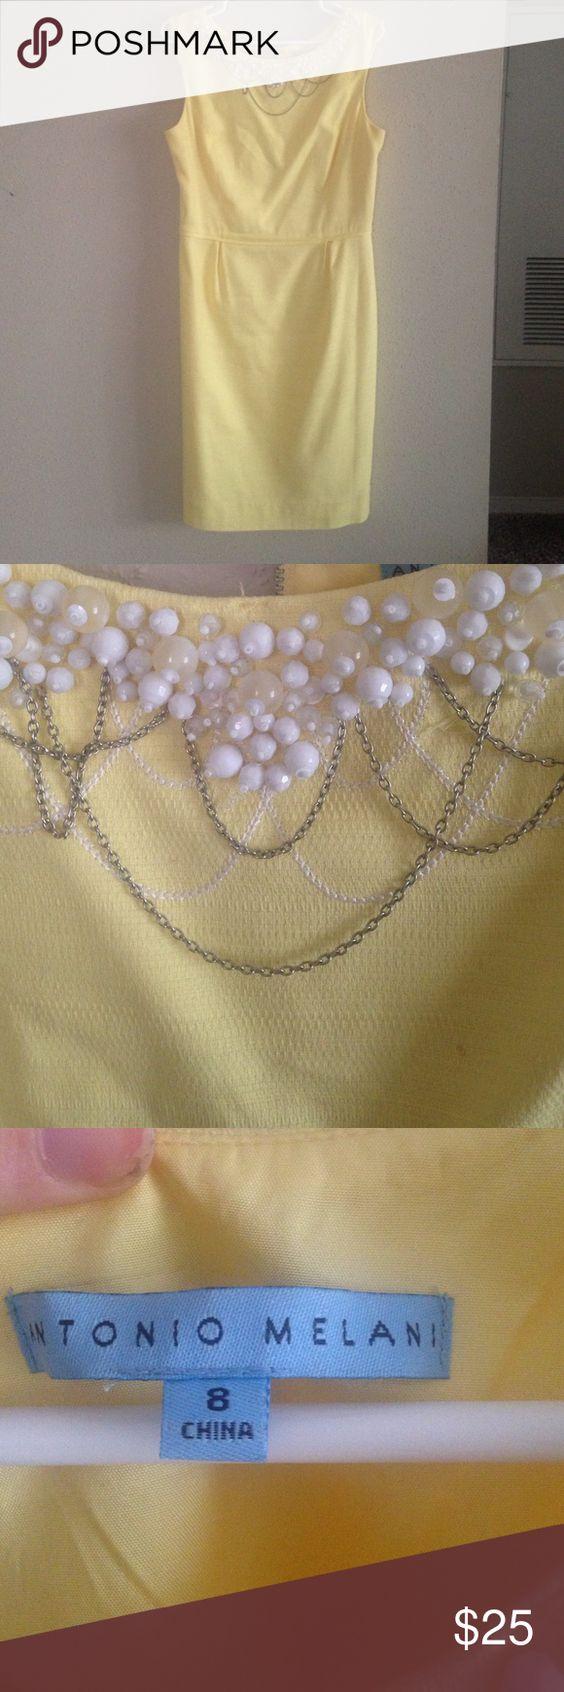 Pale Yellow Dress with Neckline Beading. 🚨 Reduced Price🚨 Pale Yellow Dress with Neckline Pearl and Chain Beading. Size 8. ANTONIO MELANI Dresses Midi